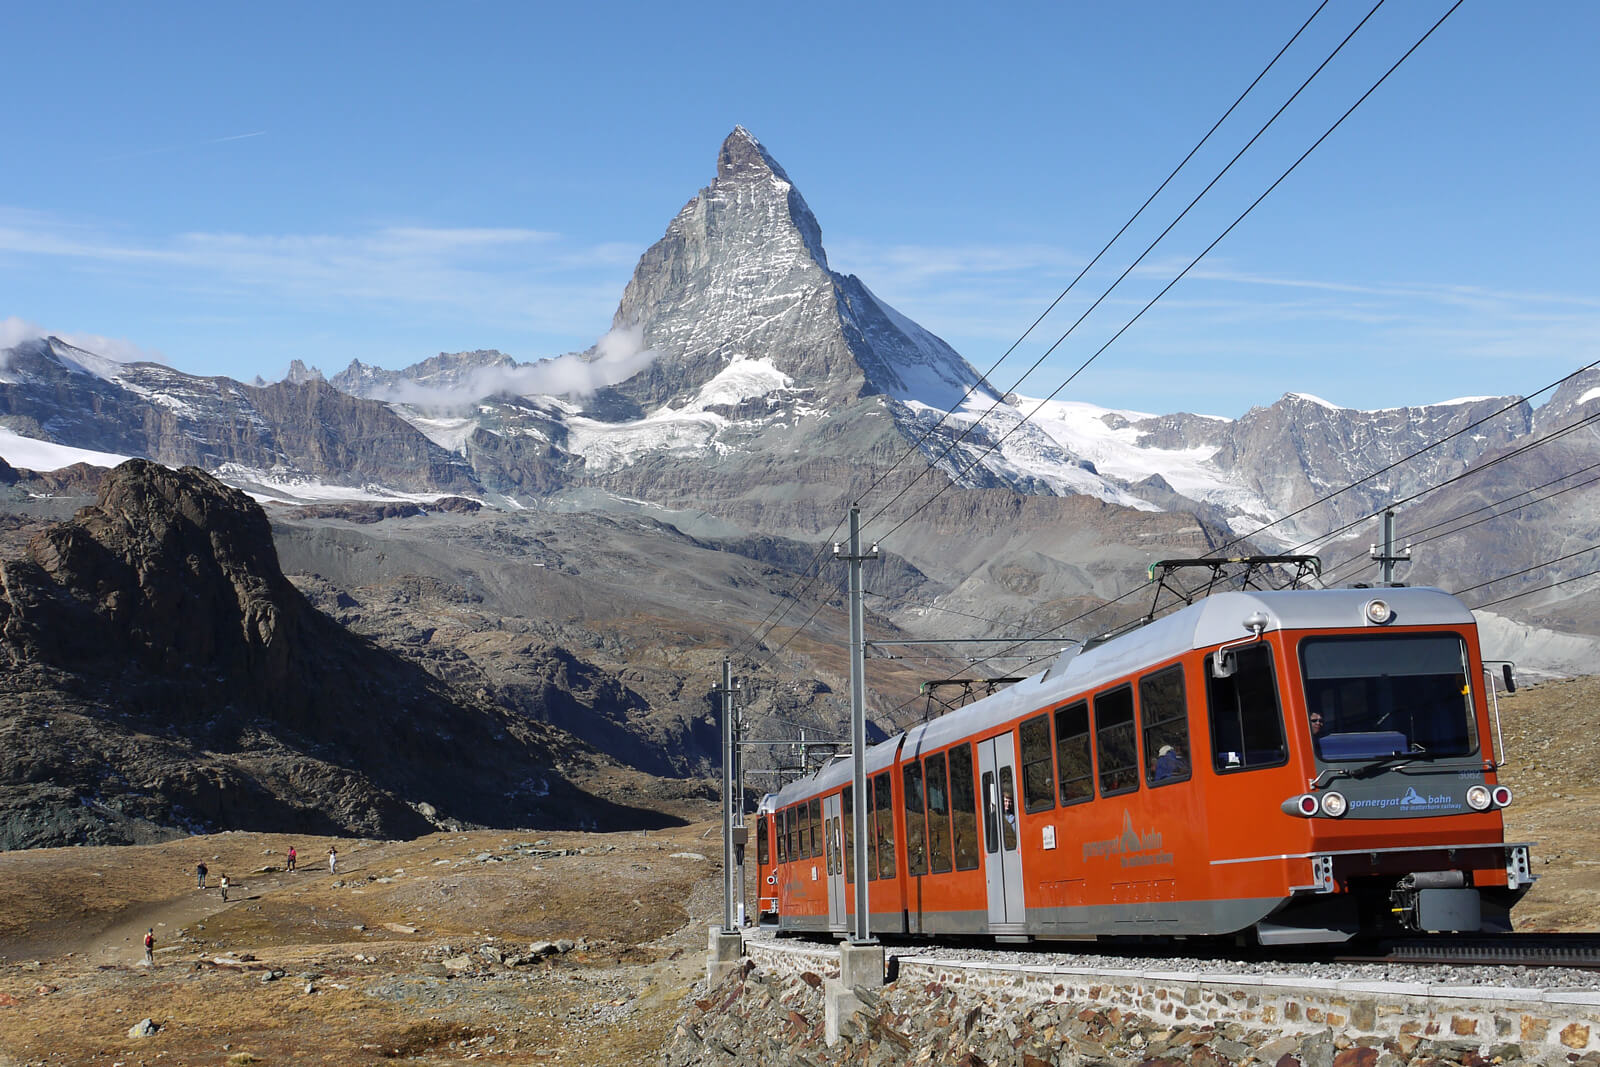 Gornergrat Railway in Zermatt